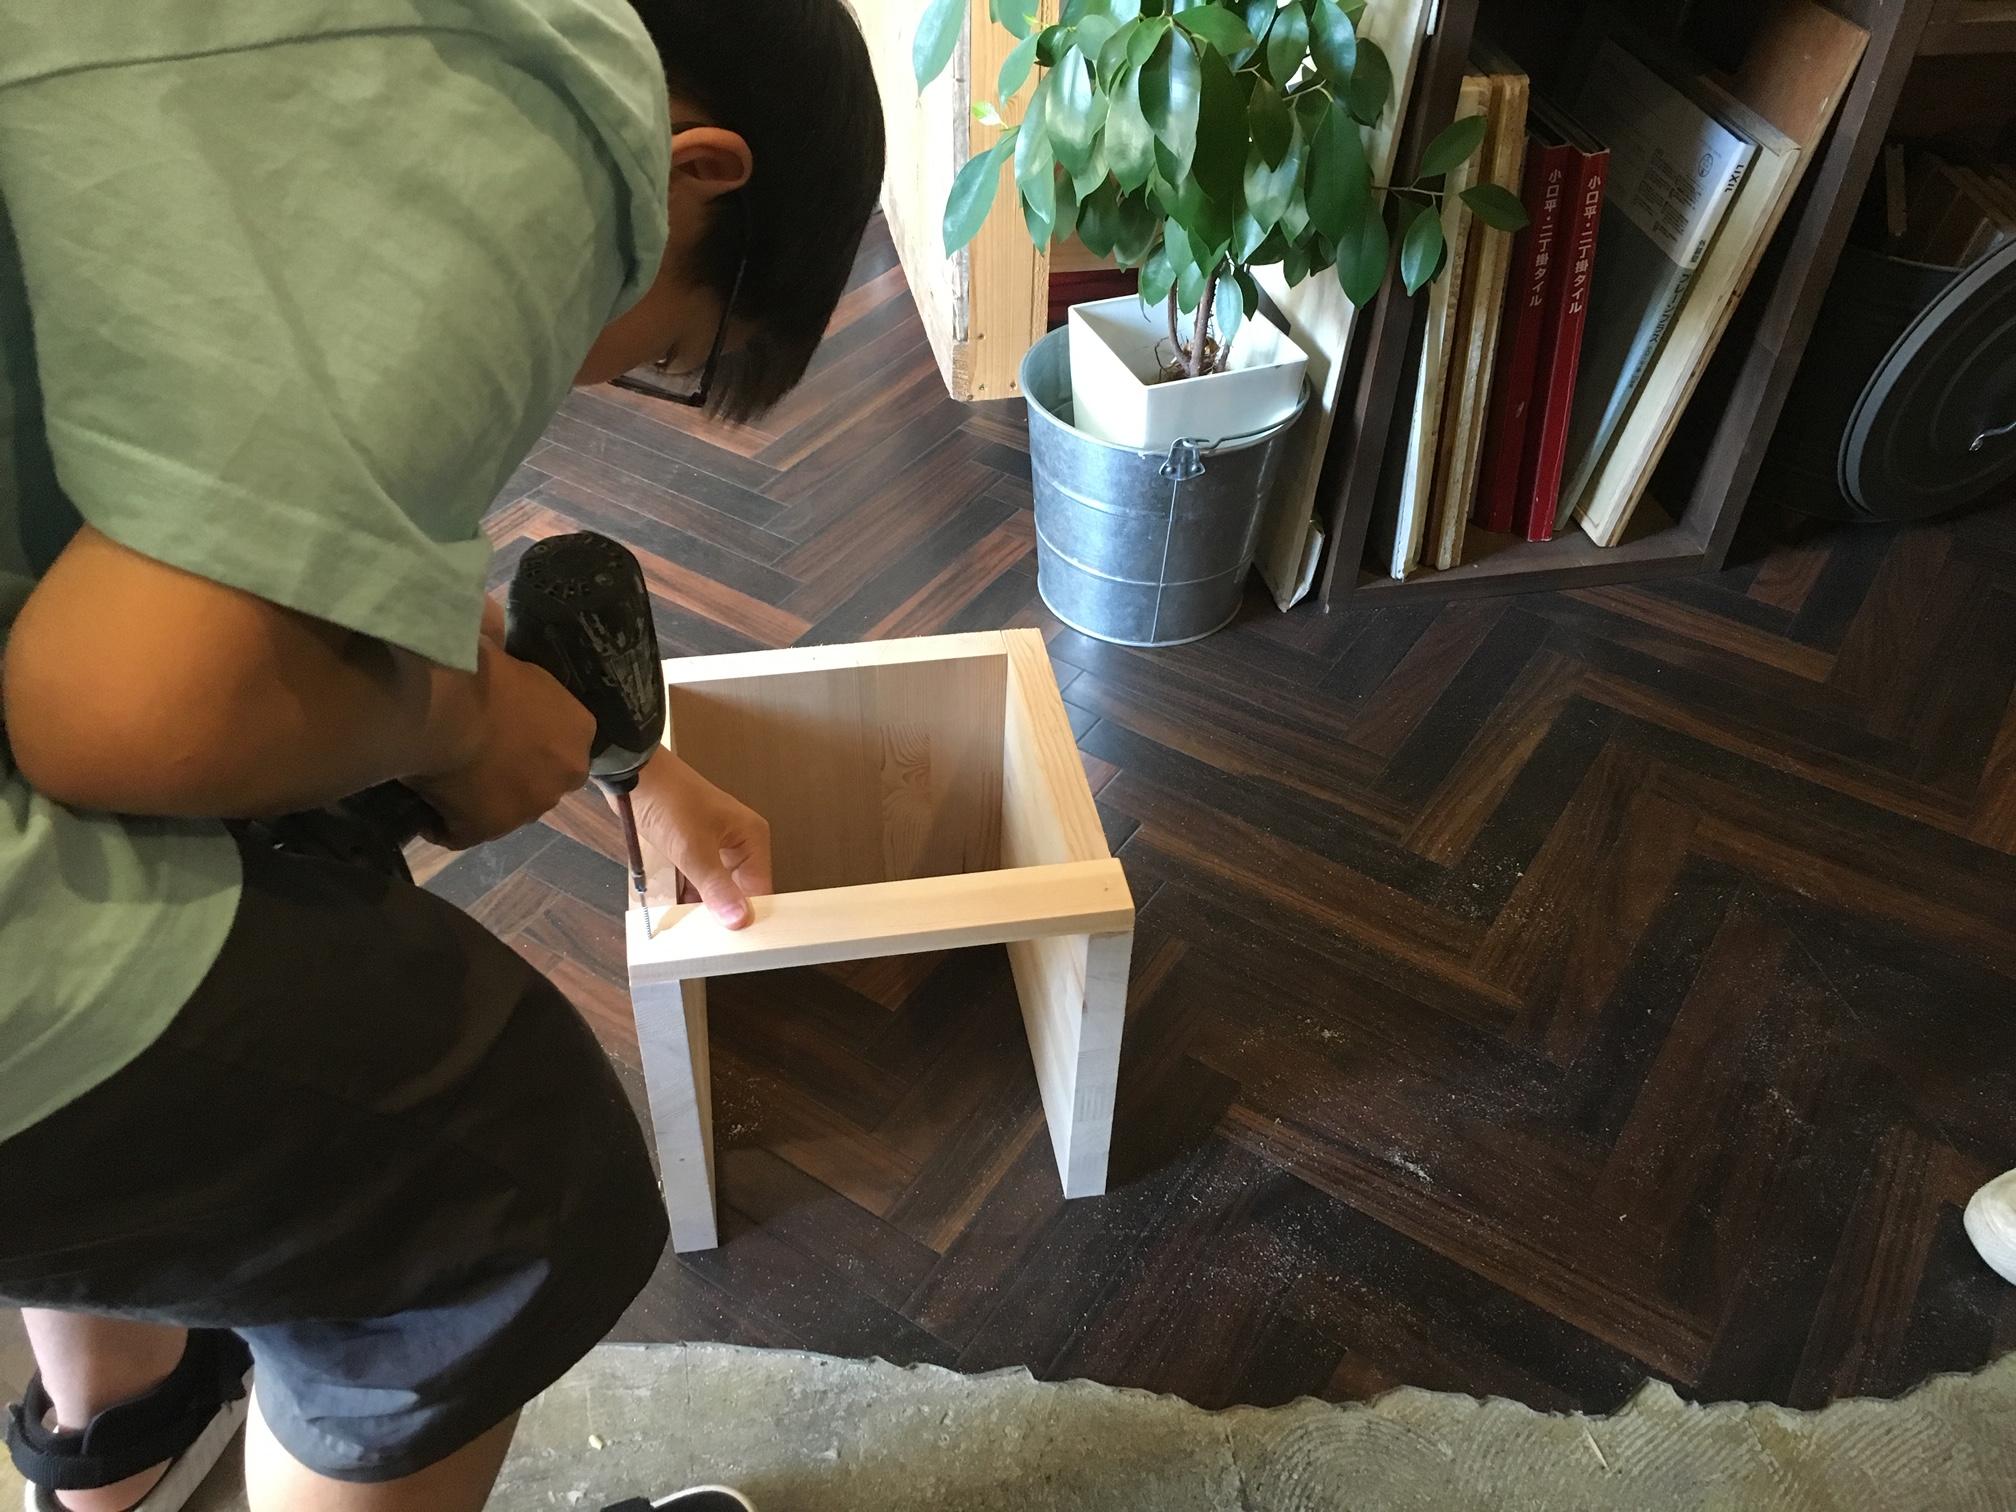 DIY体験京都 課題づくり